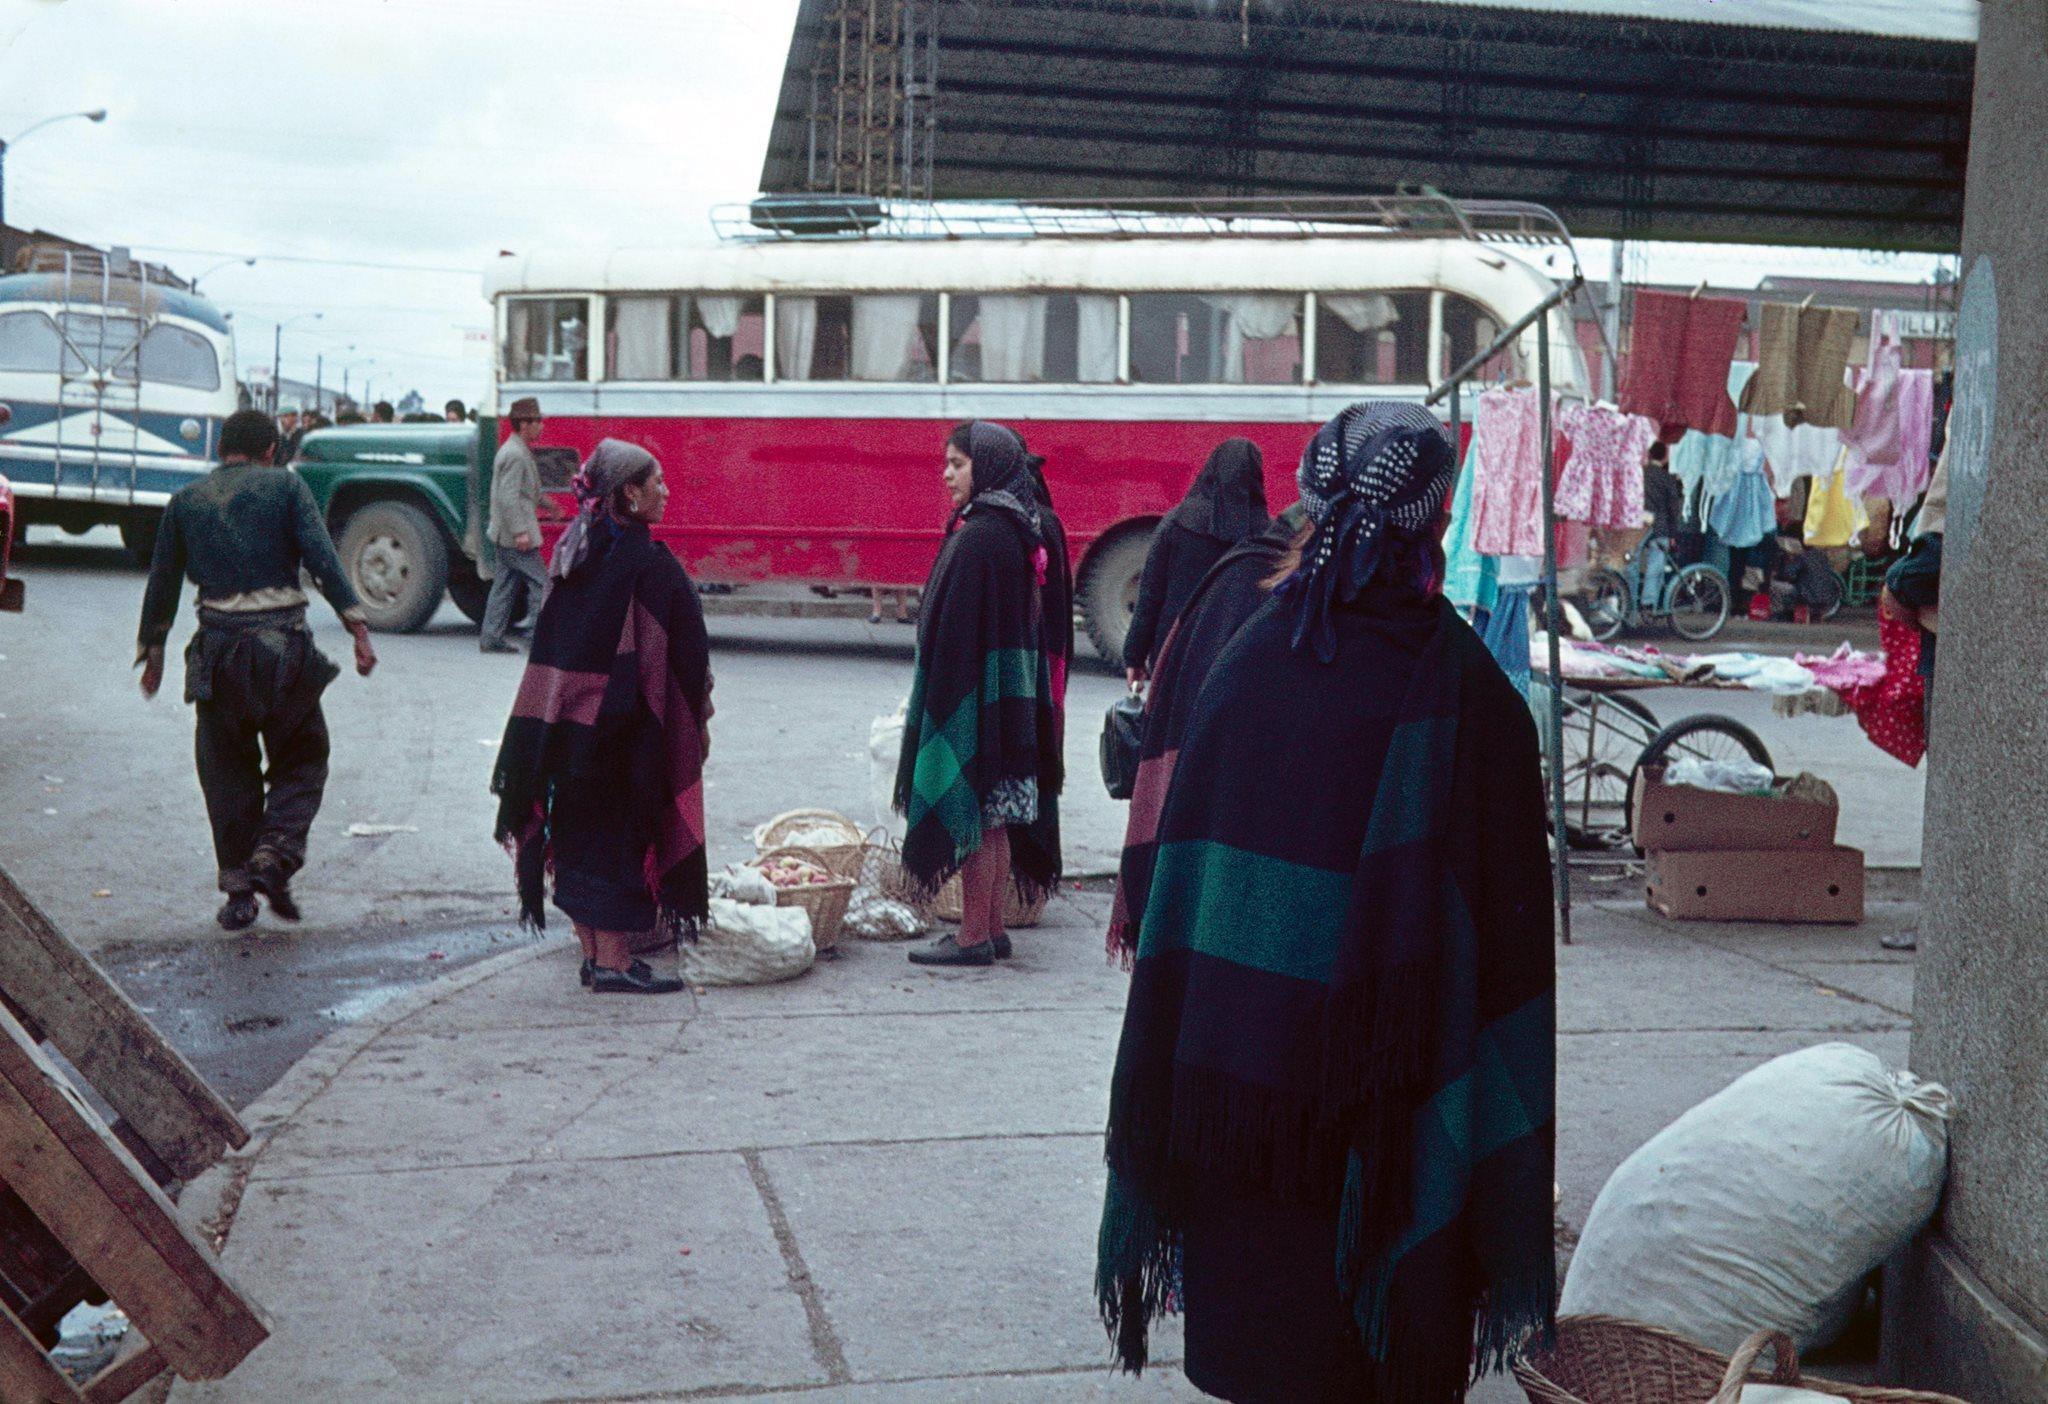 Vendedoras mapuche en Feria Pinto de Temuco, año 1969. @FotosHistóricasdeChile